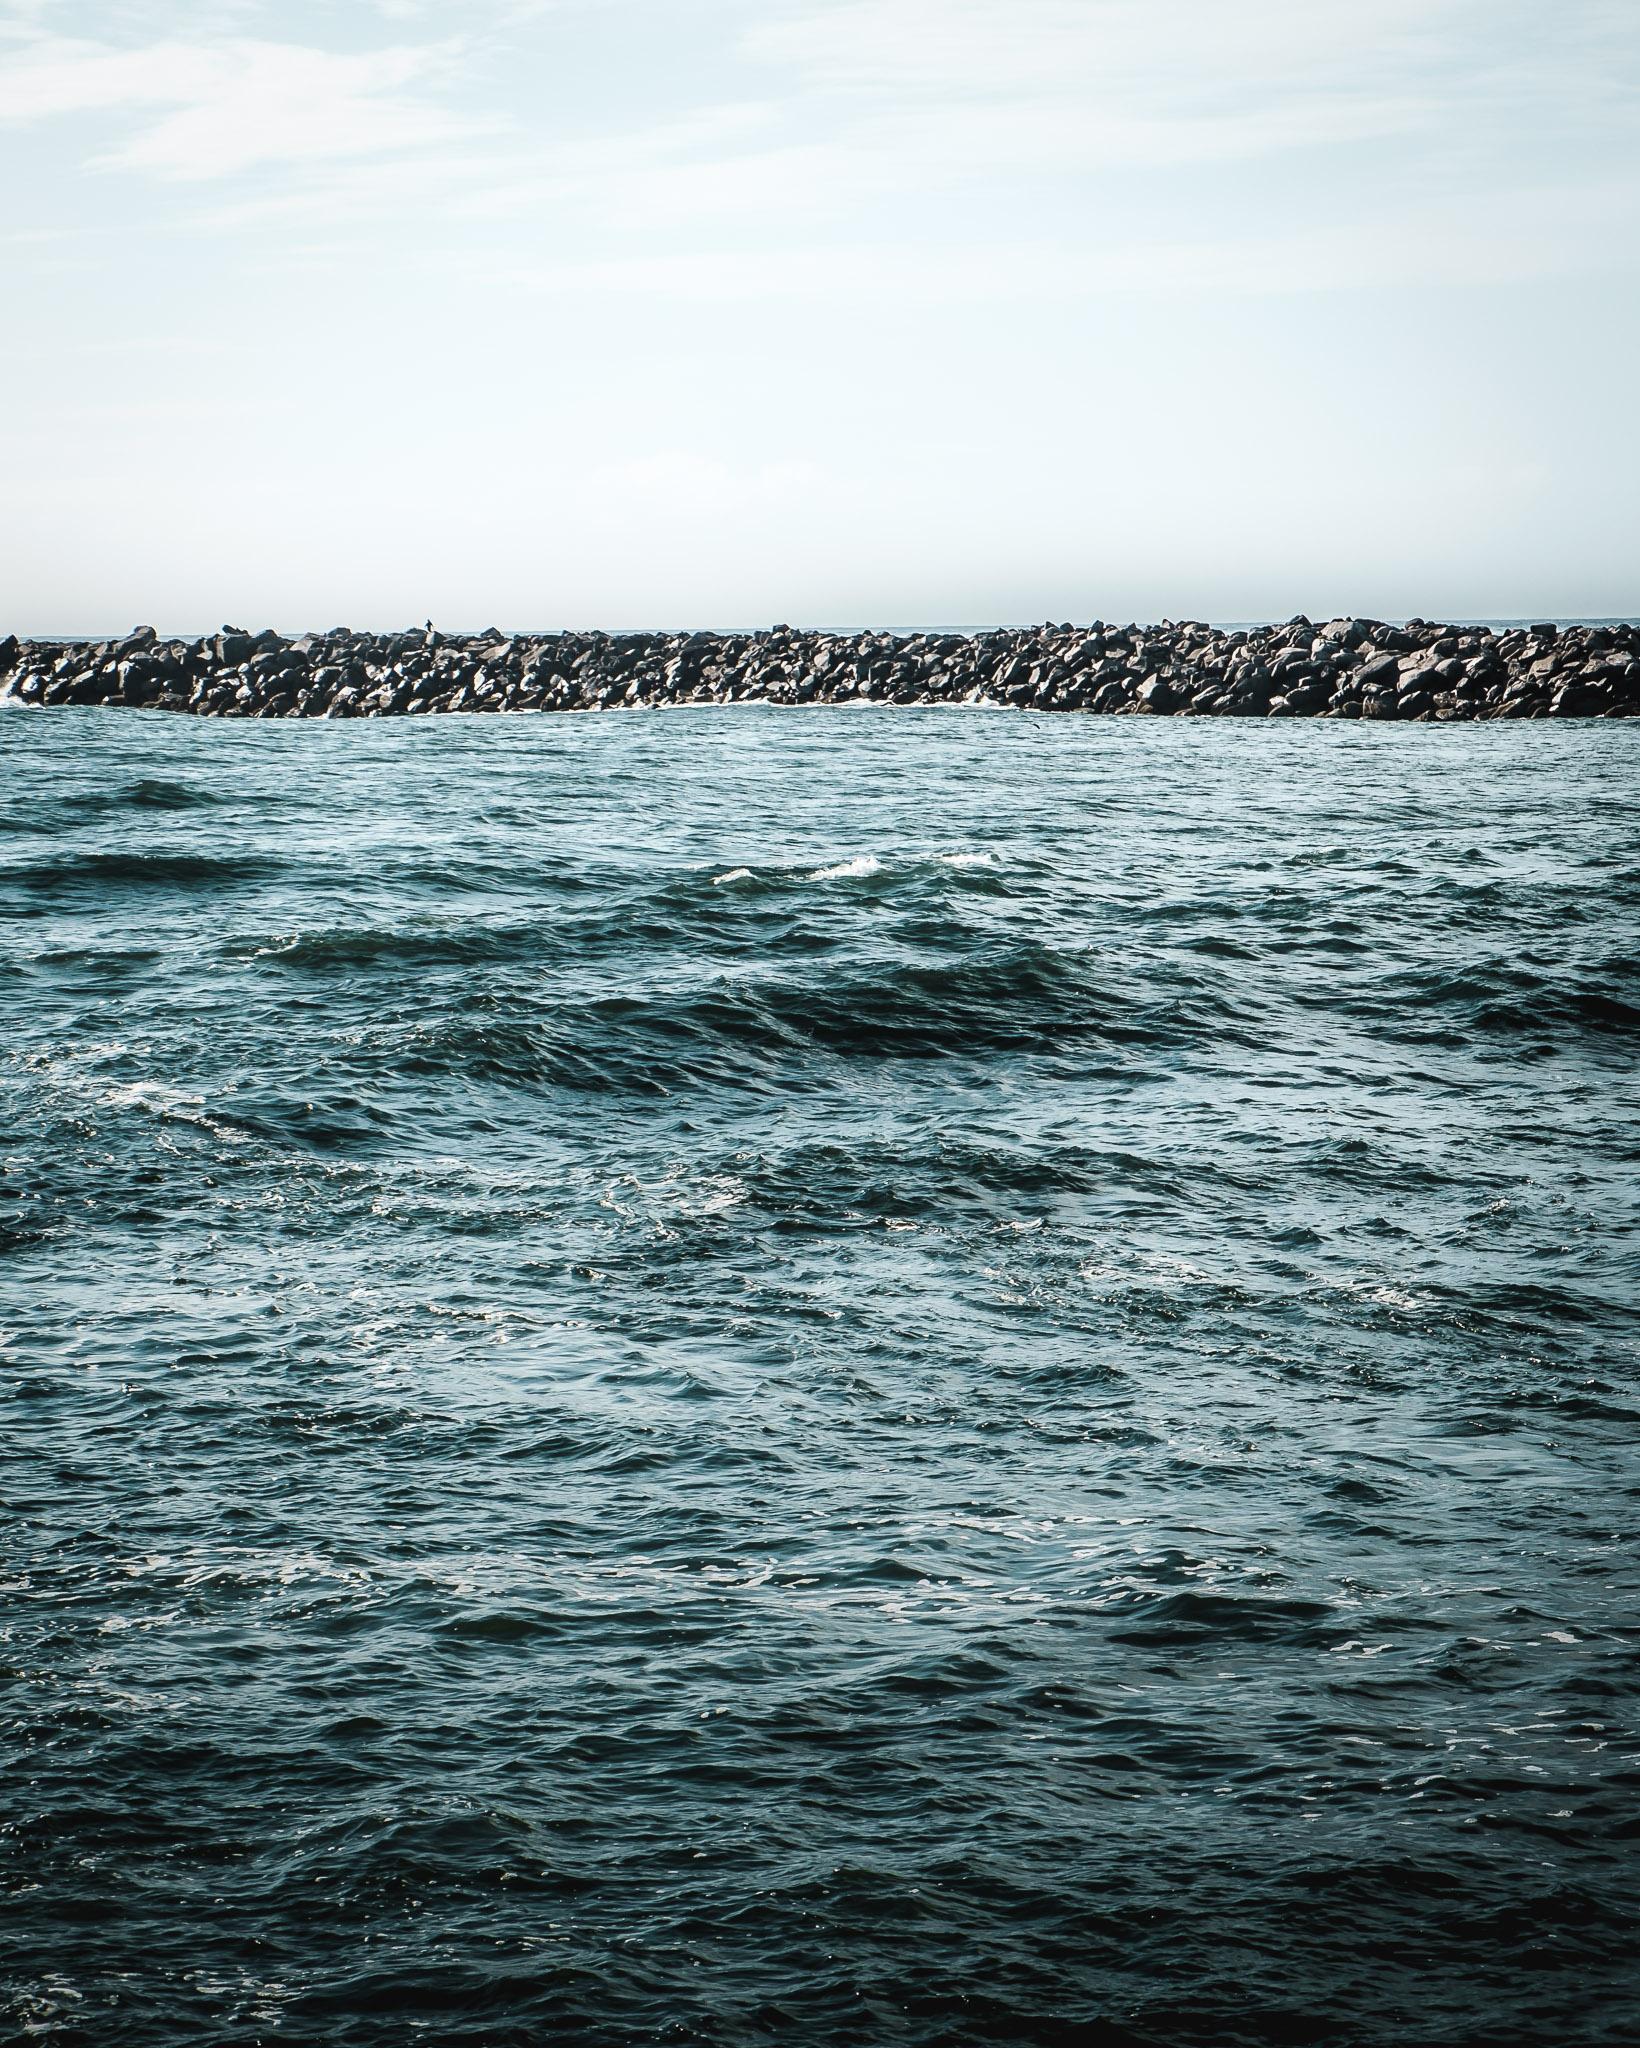 Four foot seas. Jetty at Newport, Oregon. Fujifilm XE-1, XF18-55mm @ 53mm, ISO 200, f/11, 1/250.